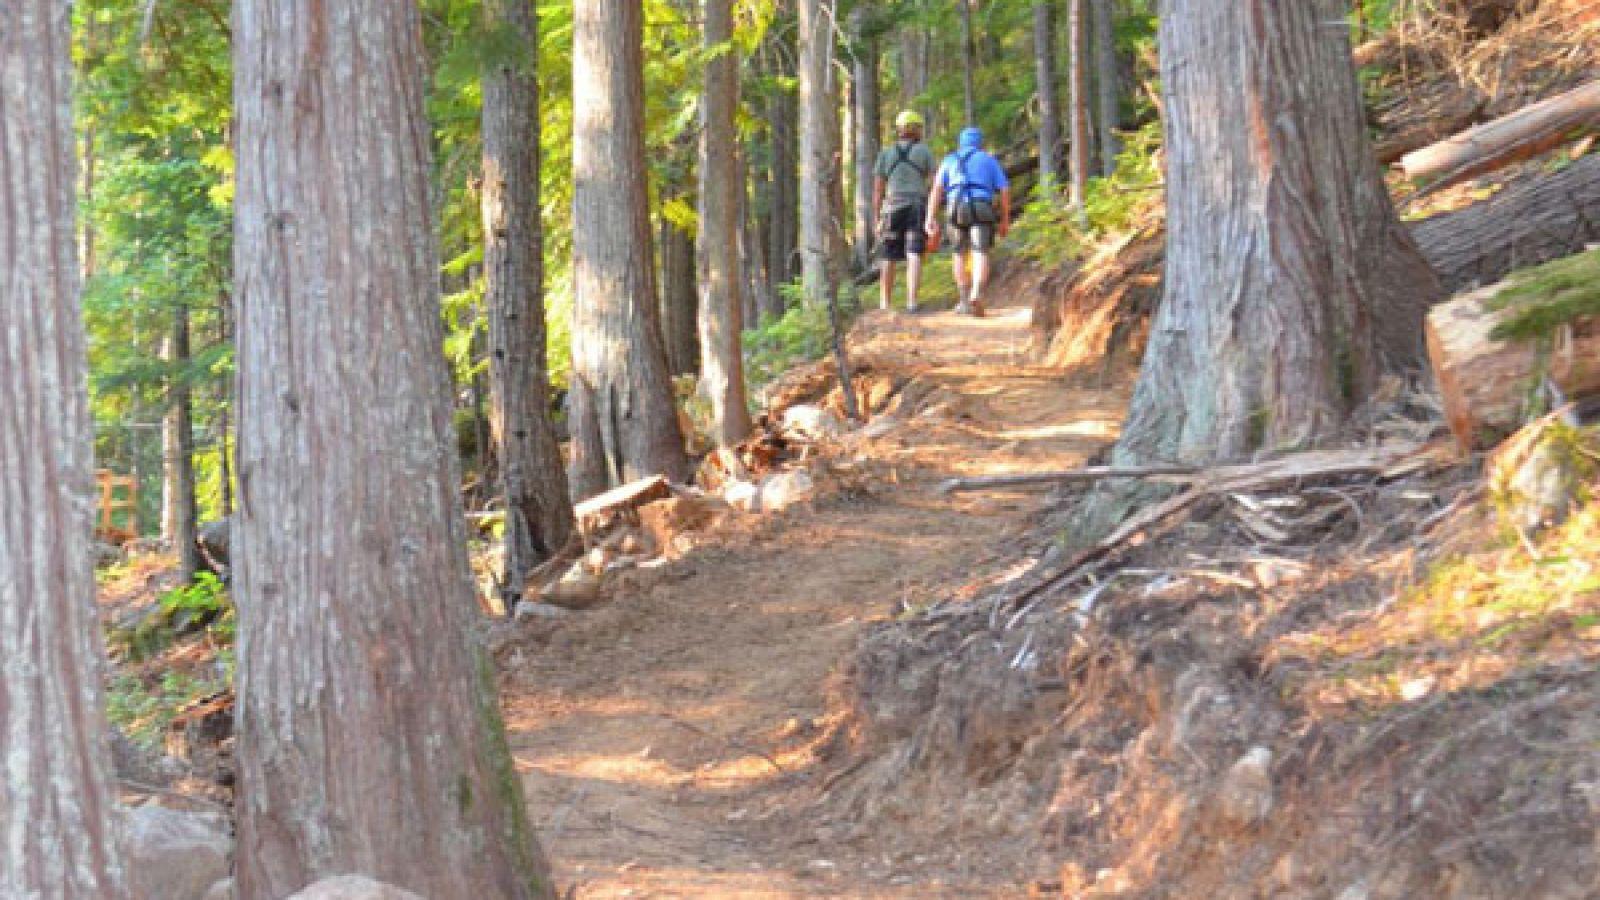 A short hike between ziplines.